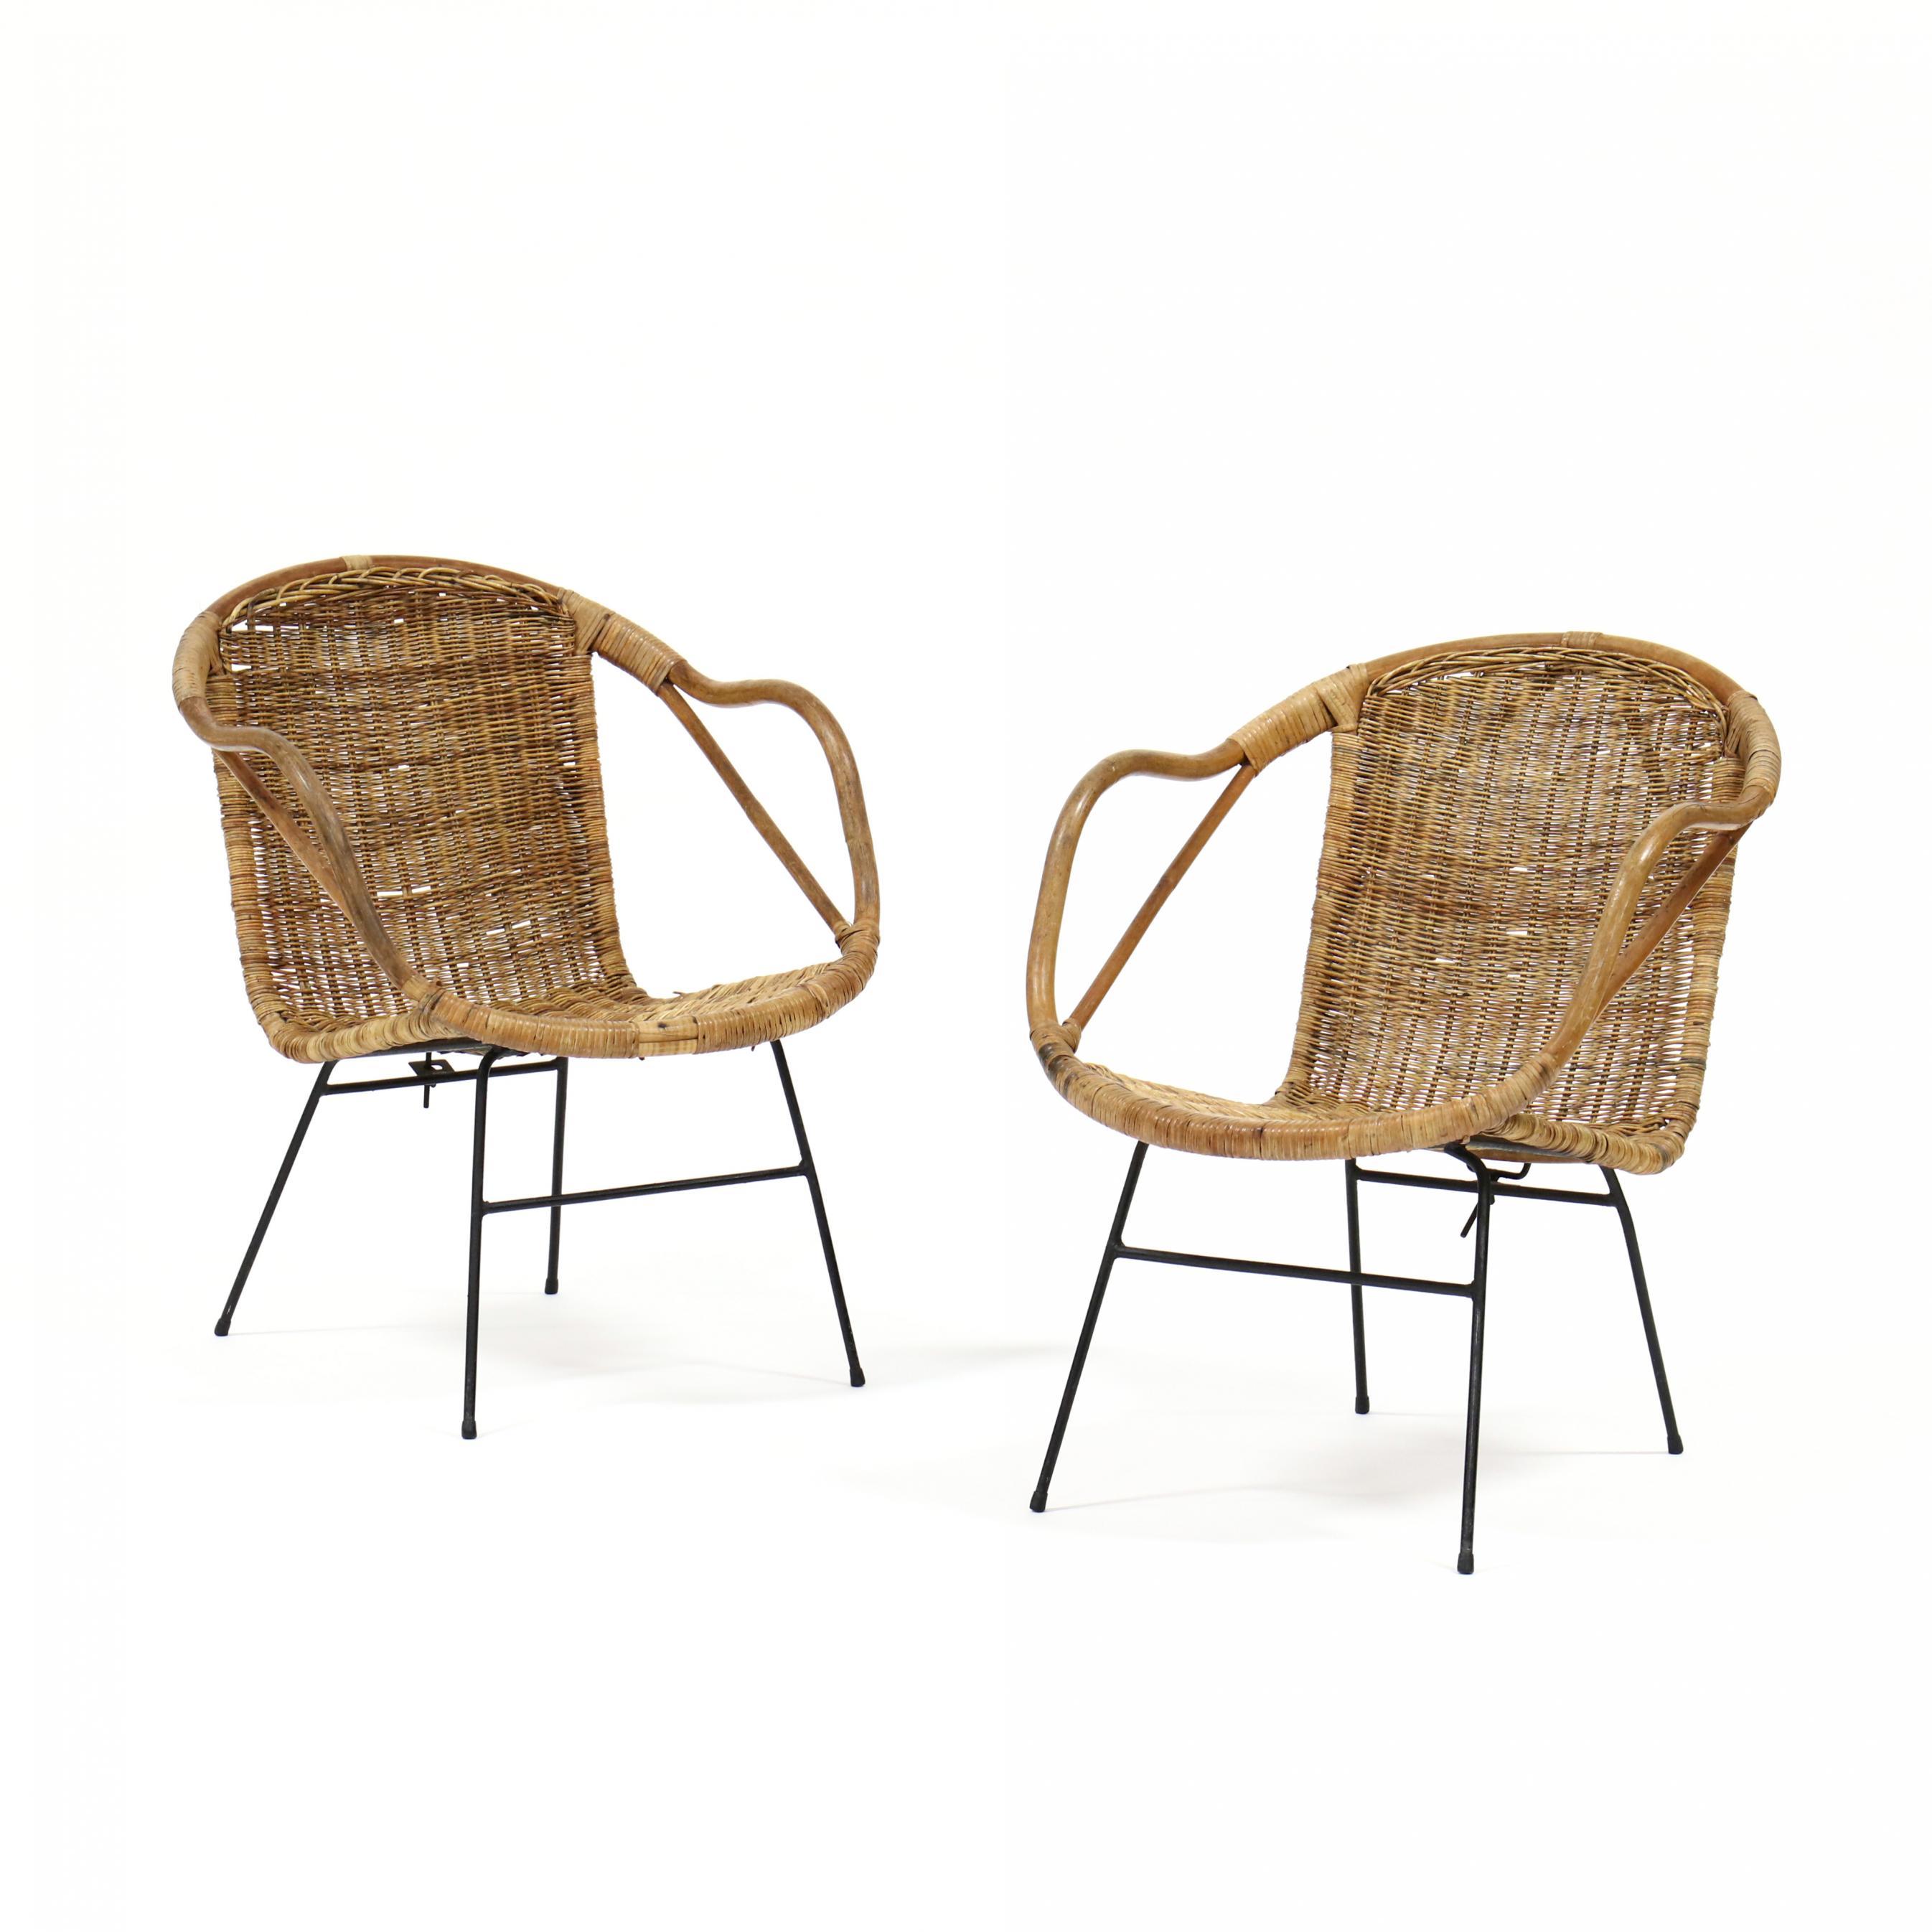 pair-of-mid-century-wicker-armchairs